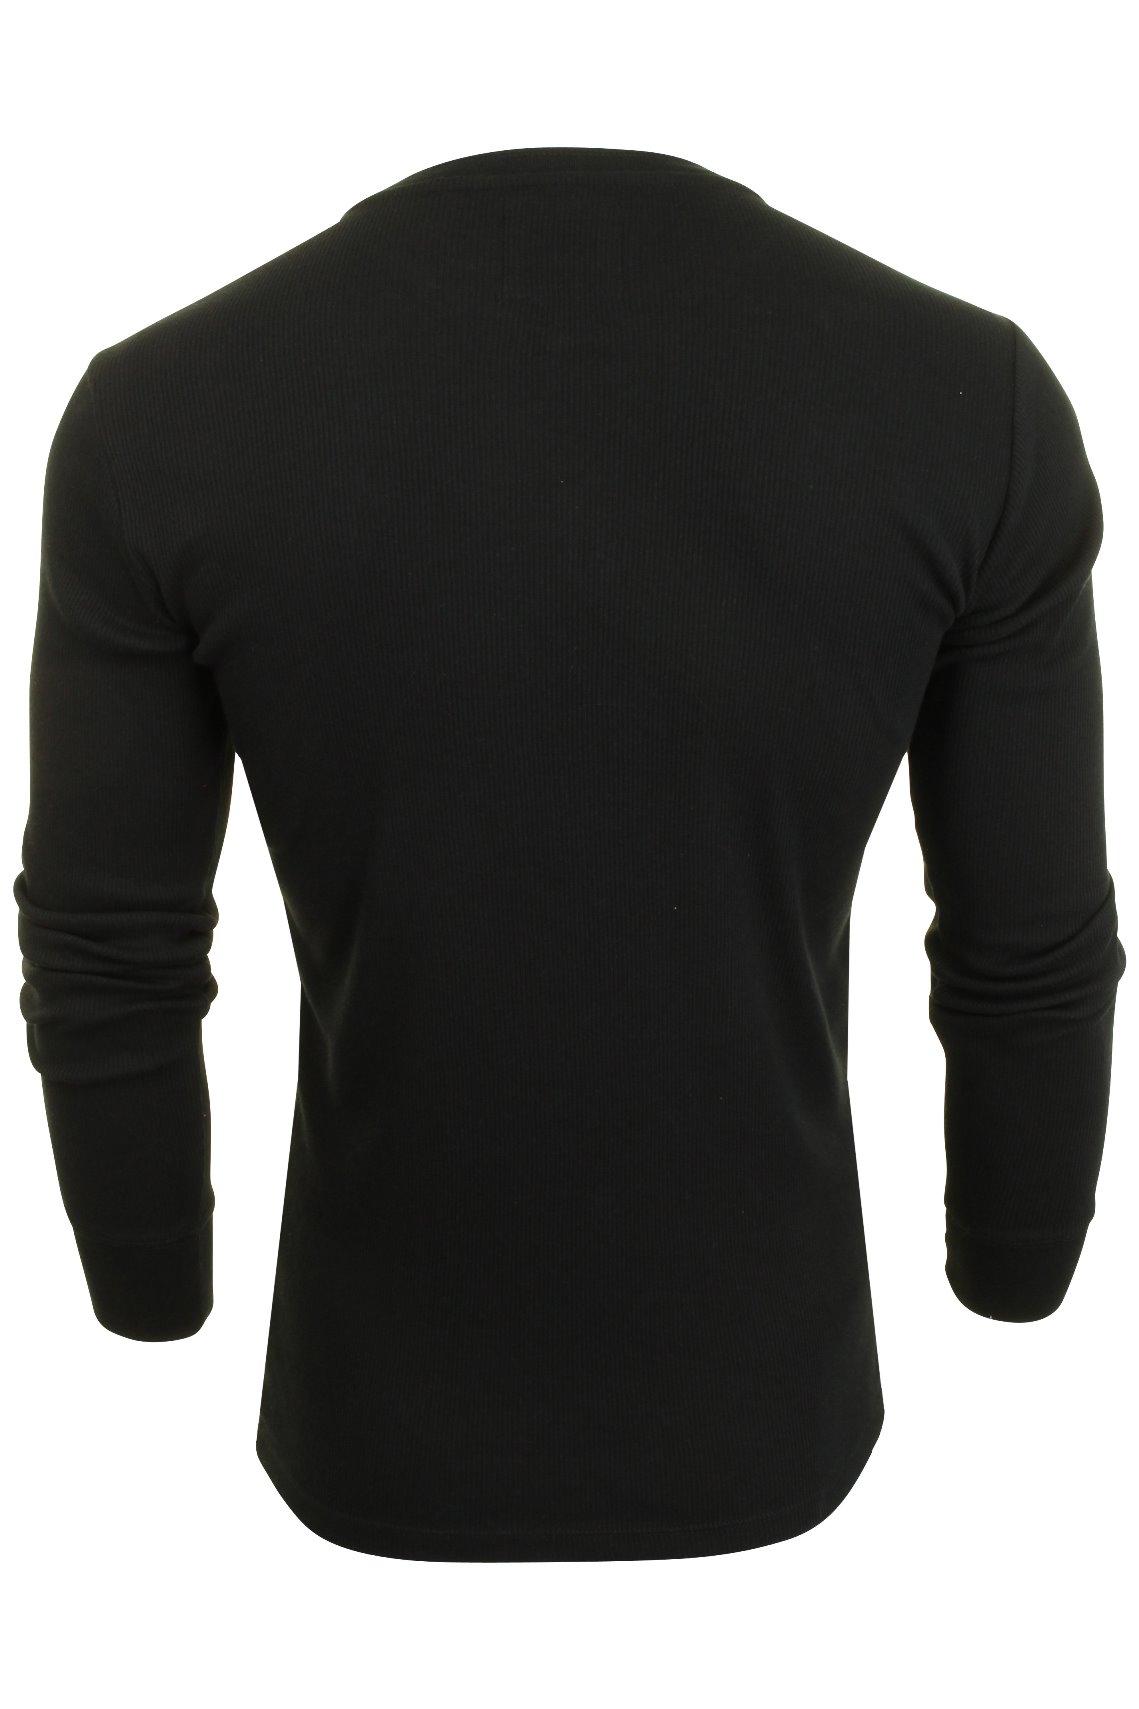 Levi-039-s-Homme-Grandad-039-300LS-Henley-039-Rib-T-shirt-a-manches-longues miniature 6